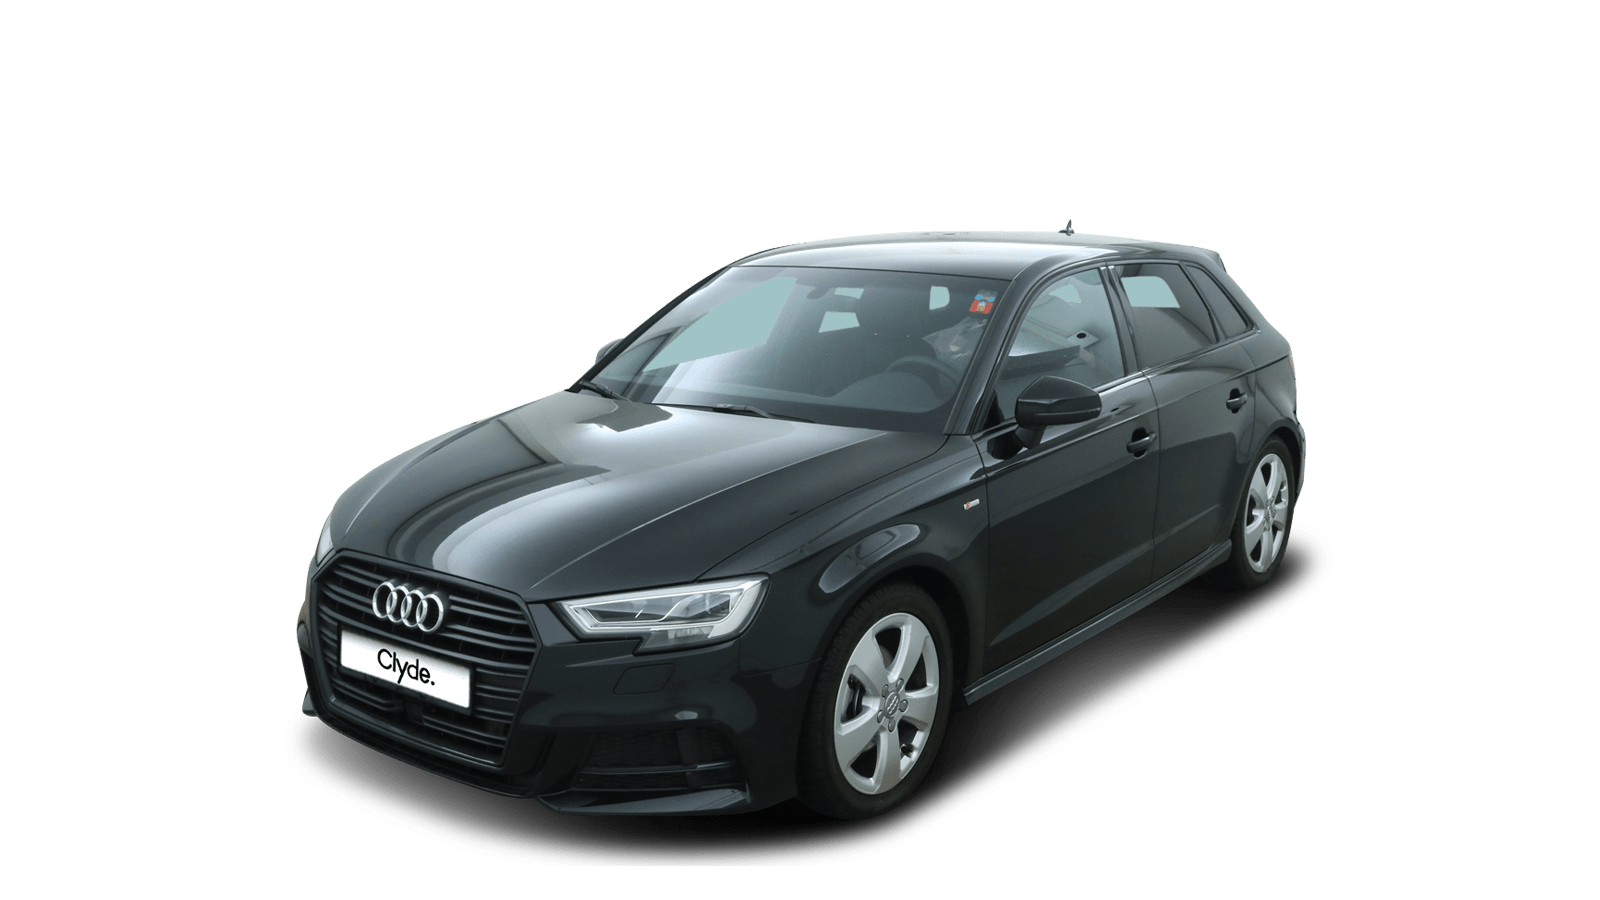 Audi A3 Sportback Black front - Clyde car subscription